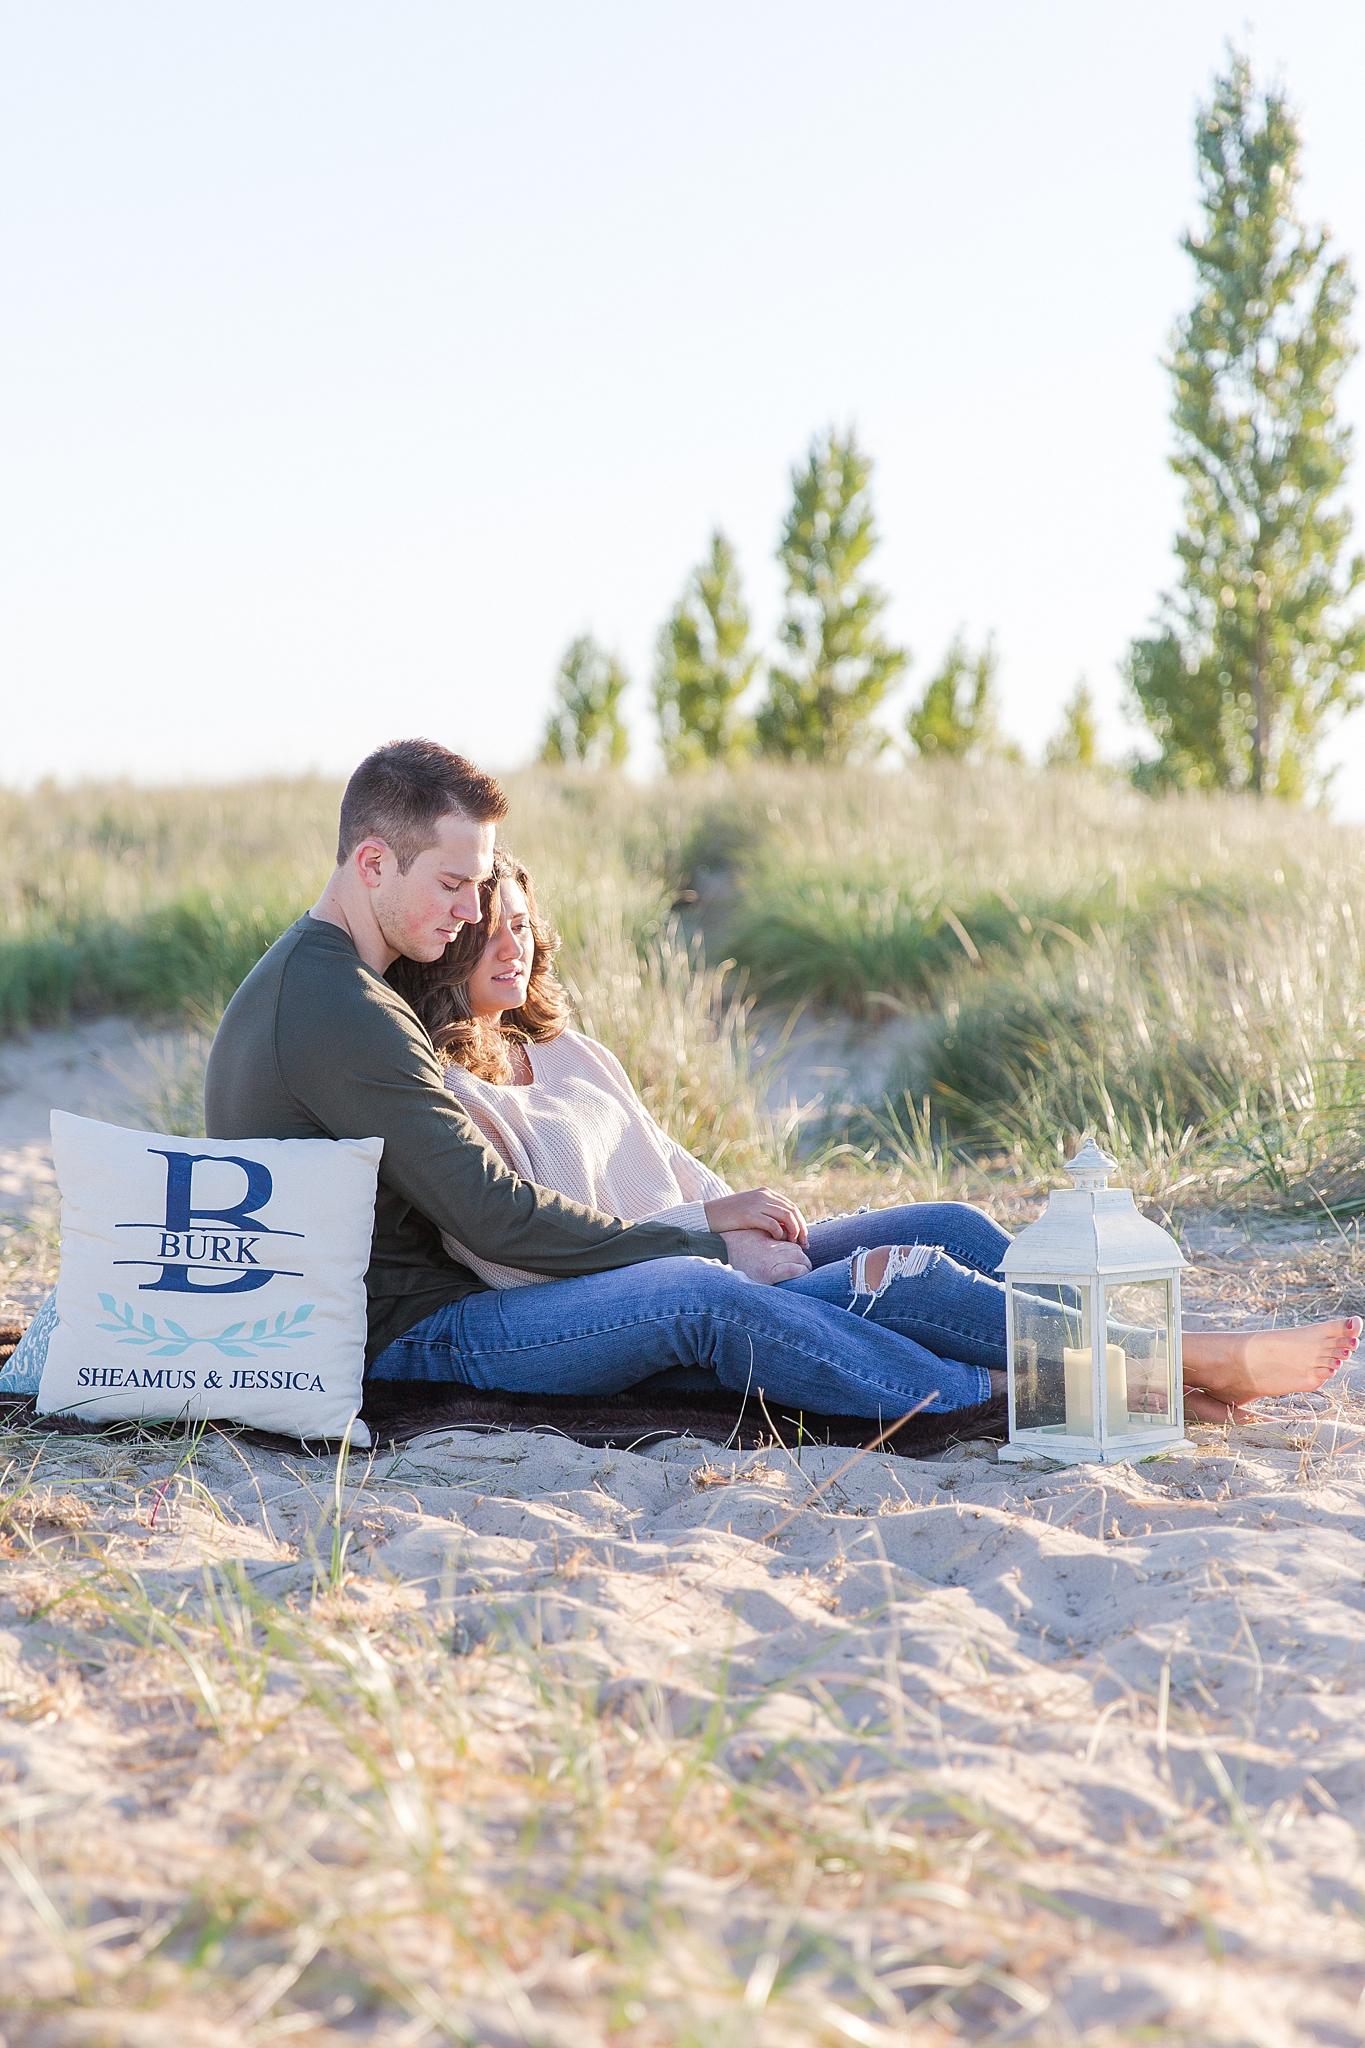 romantic--summer-beach-engagement-photography-in-st-joseph-mi-by-courtney-carolyn-photography_0023.jpg